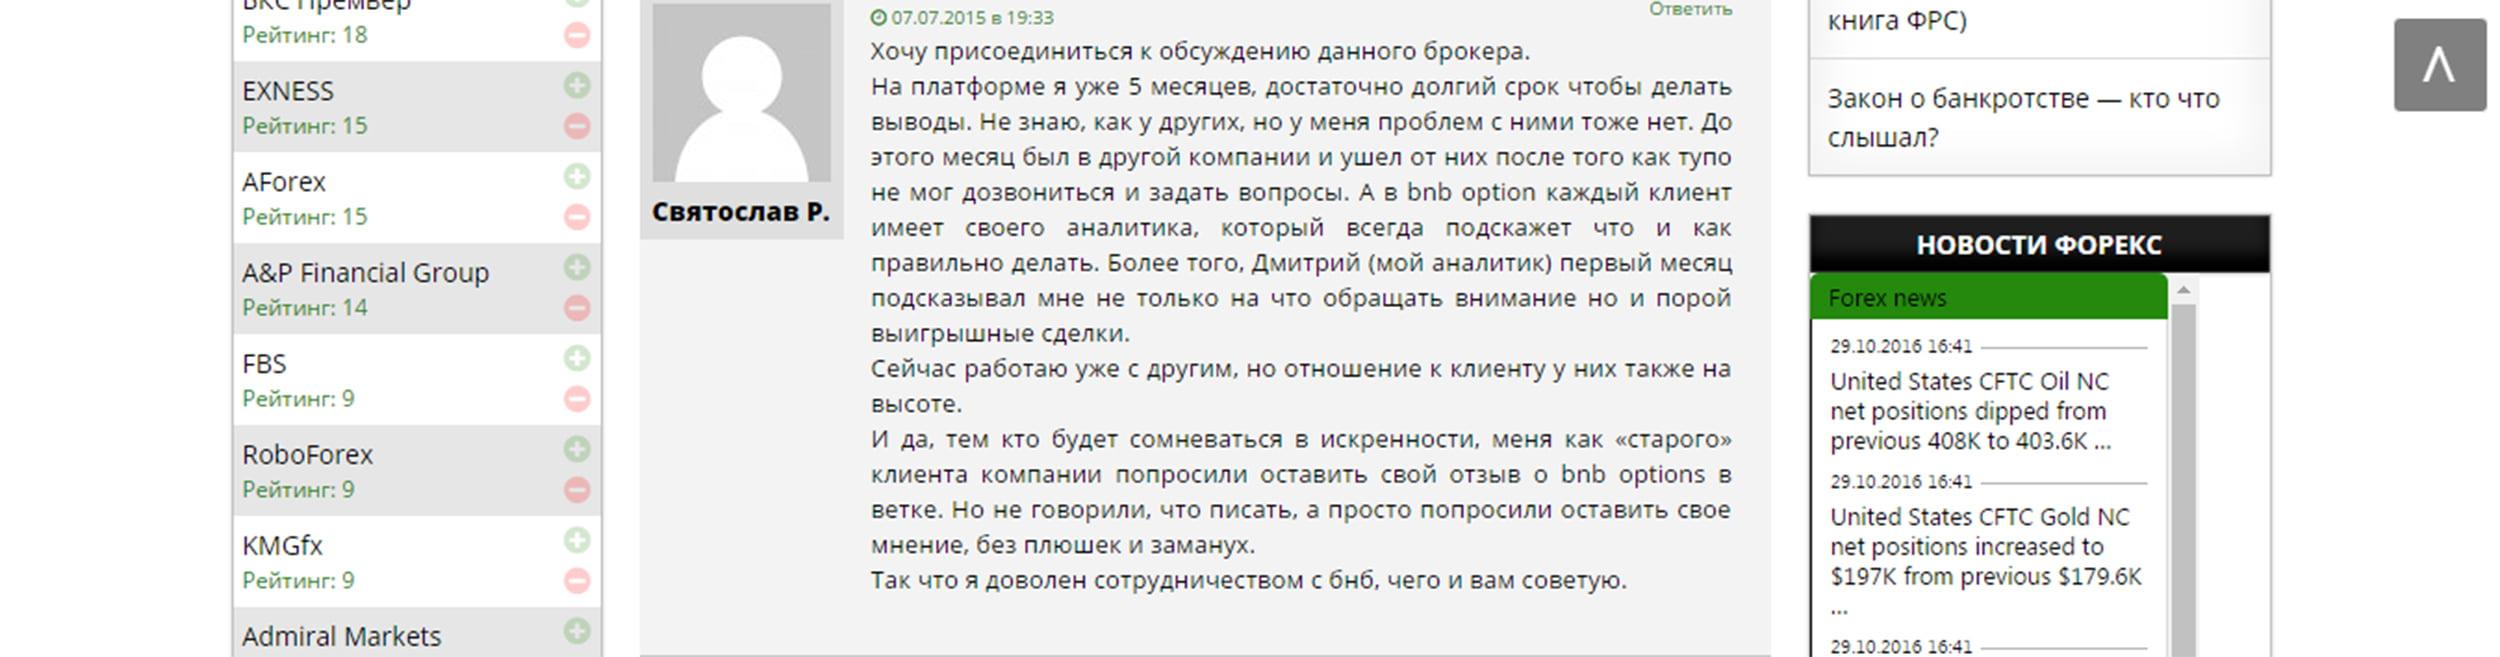 Aforex.ru лохотрон анекдоты про форекс шутки